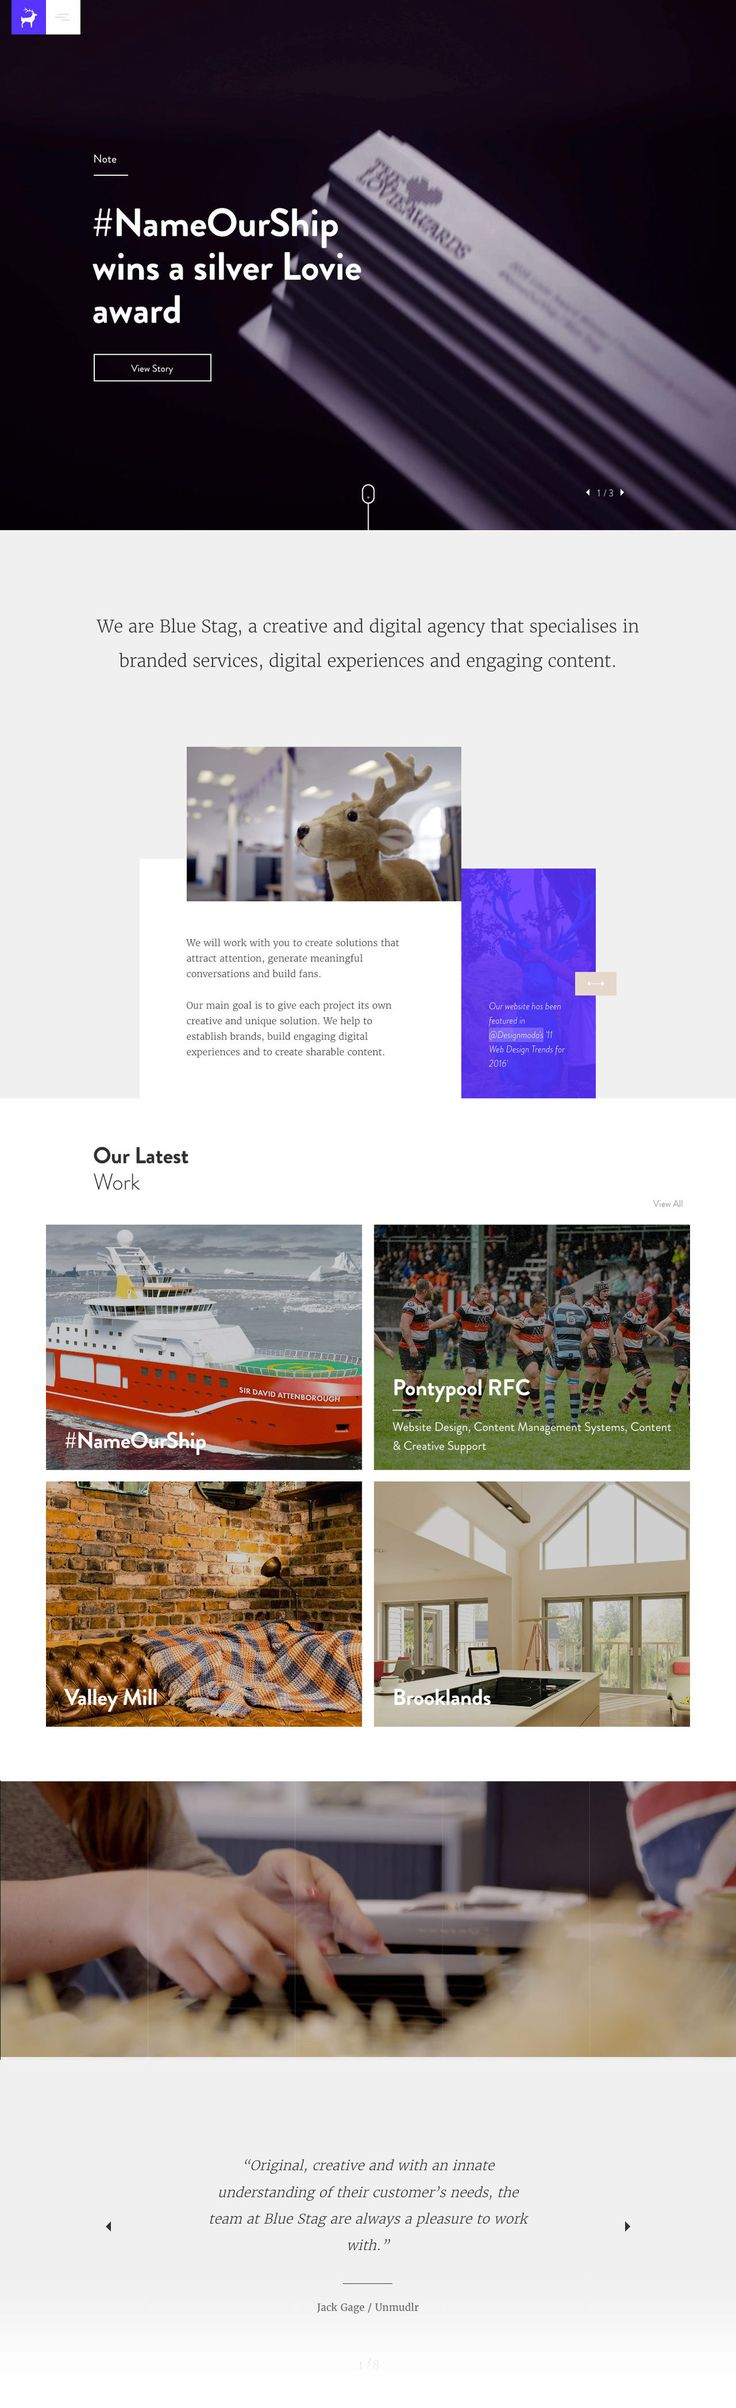 Blue Stag (More web design inspiration at topdesigninspiration.com) #design #web #webdesign #sitedesign #responsive #ux #ui